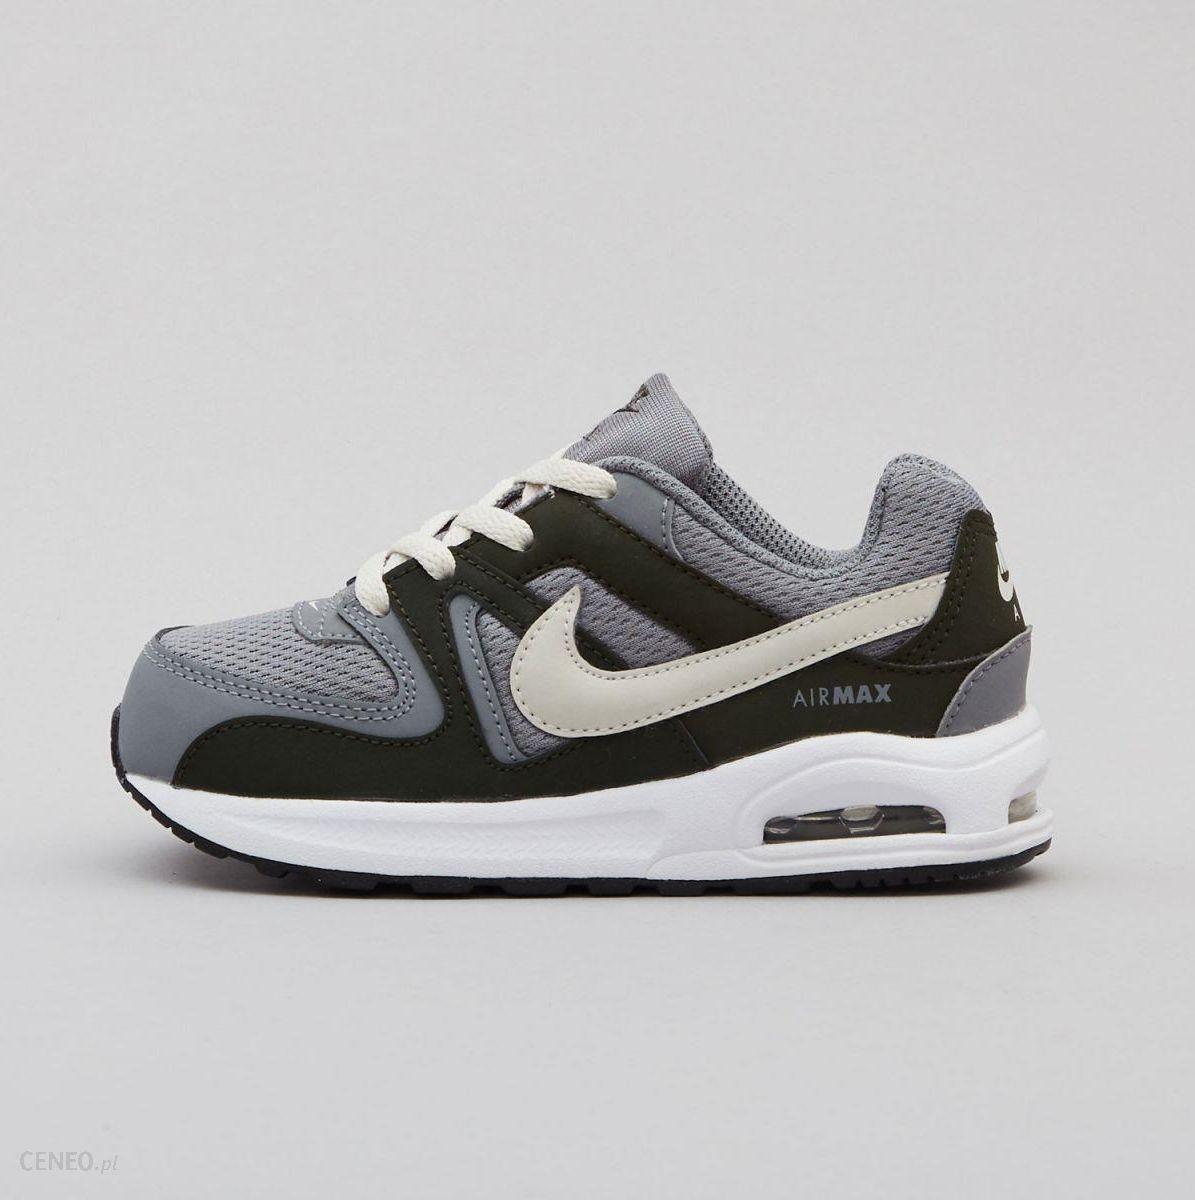 Nike AIR MAX COMMAND FLEX (TD) 844348 006 Ceny i opinie Ceneo.pl